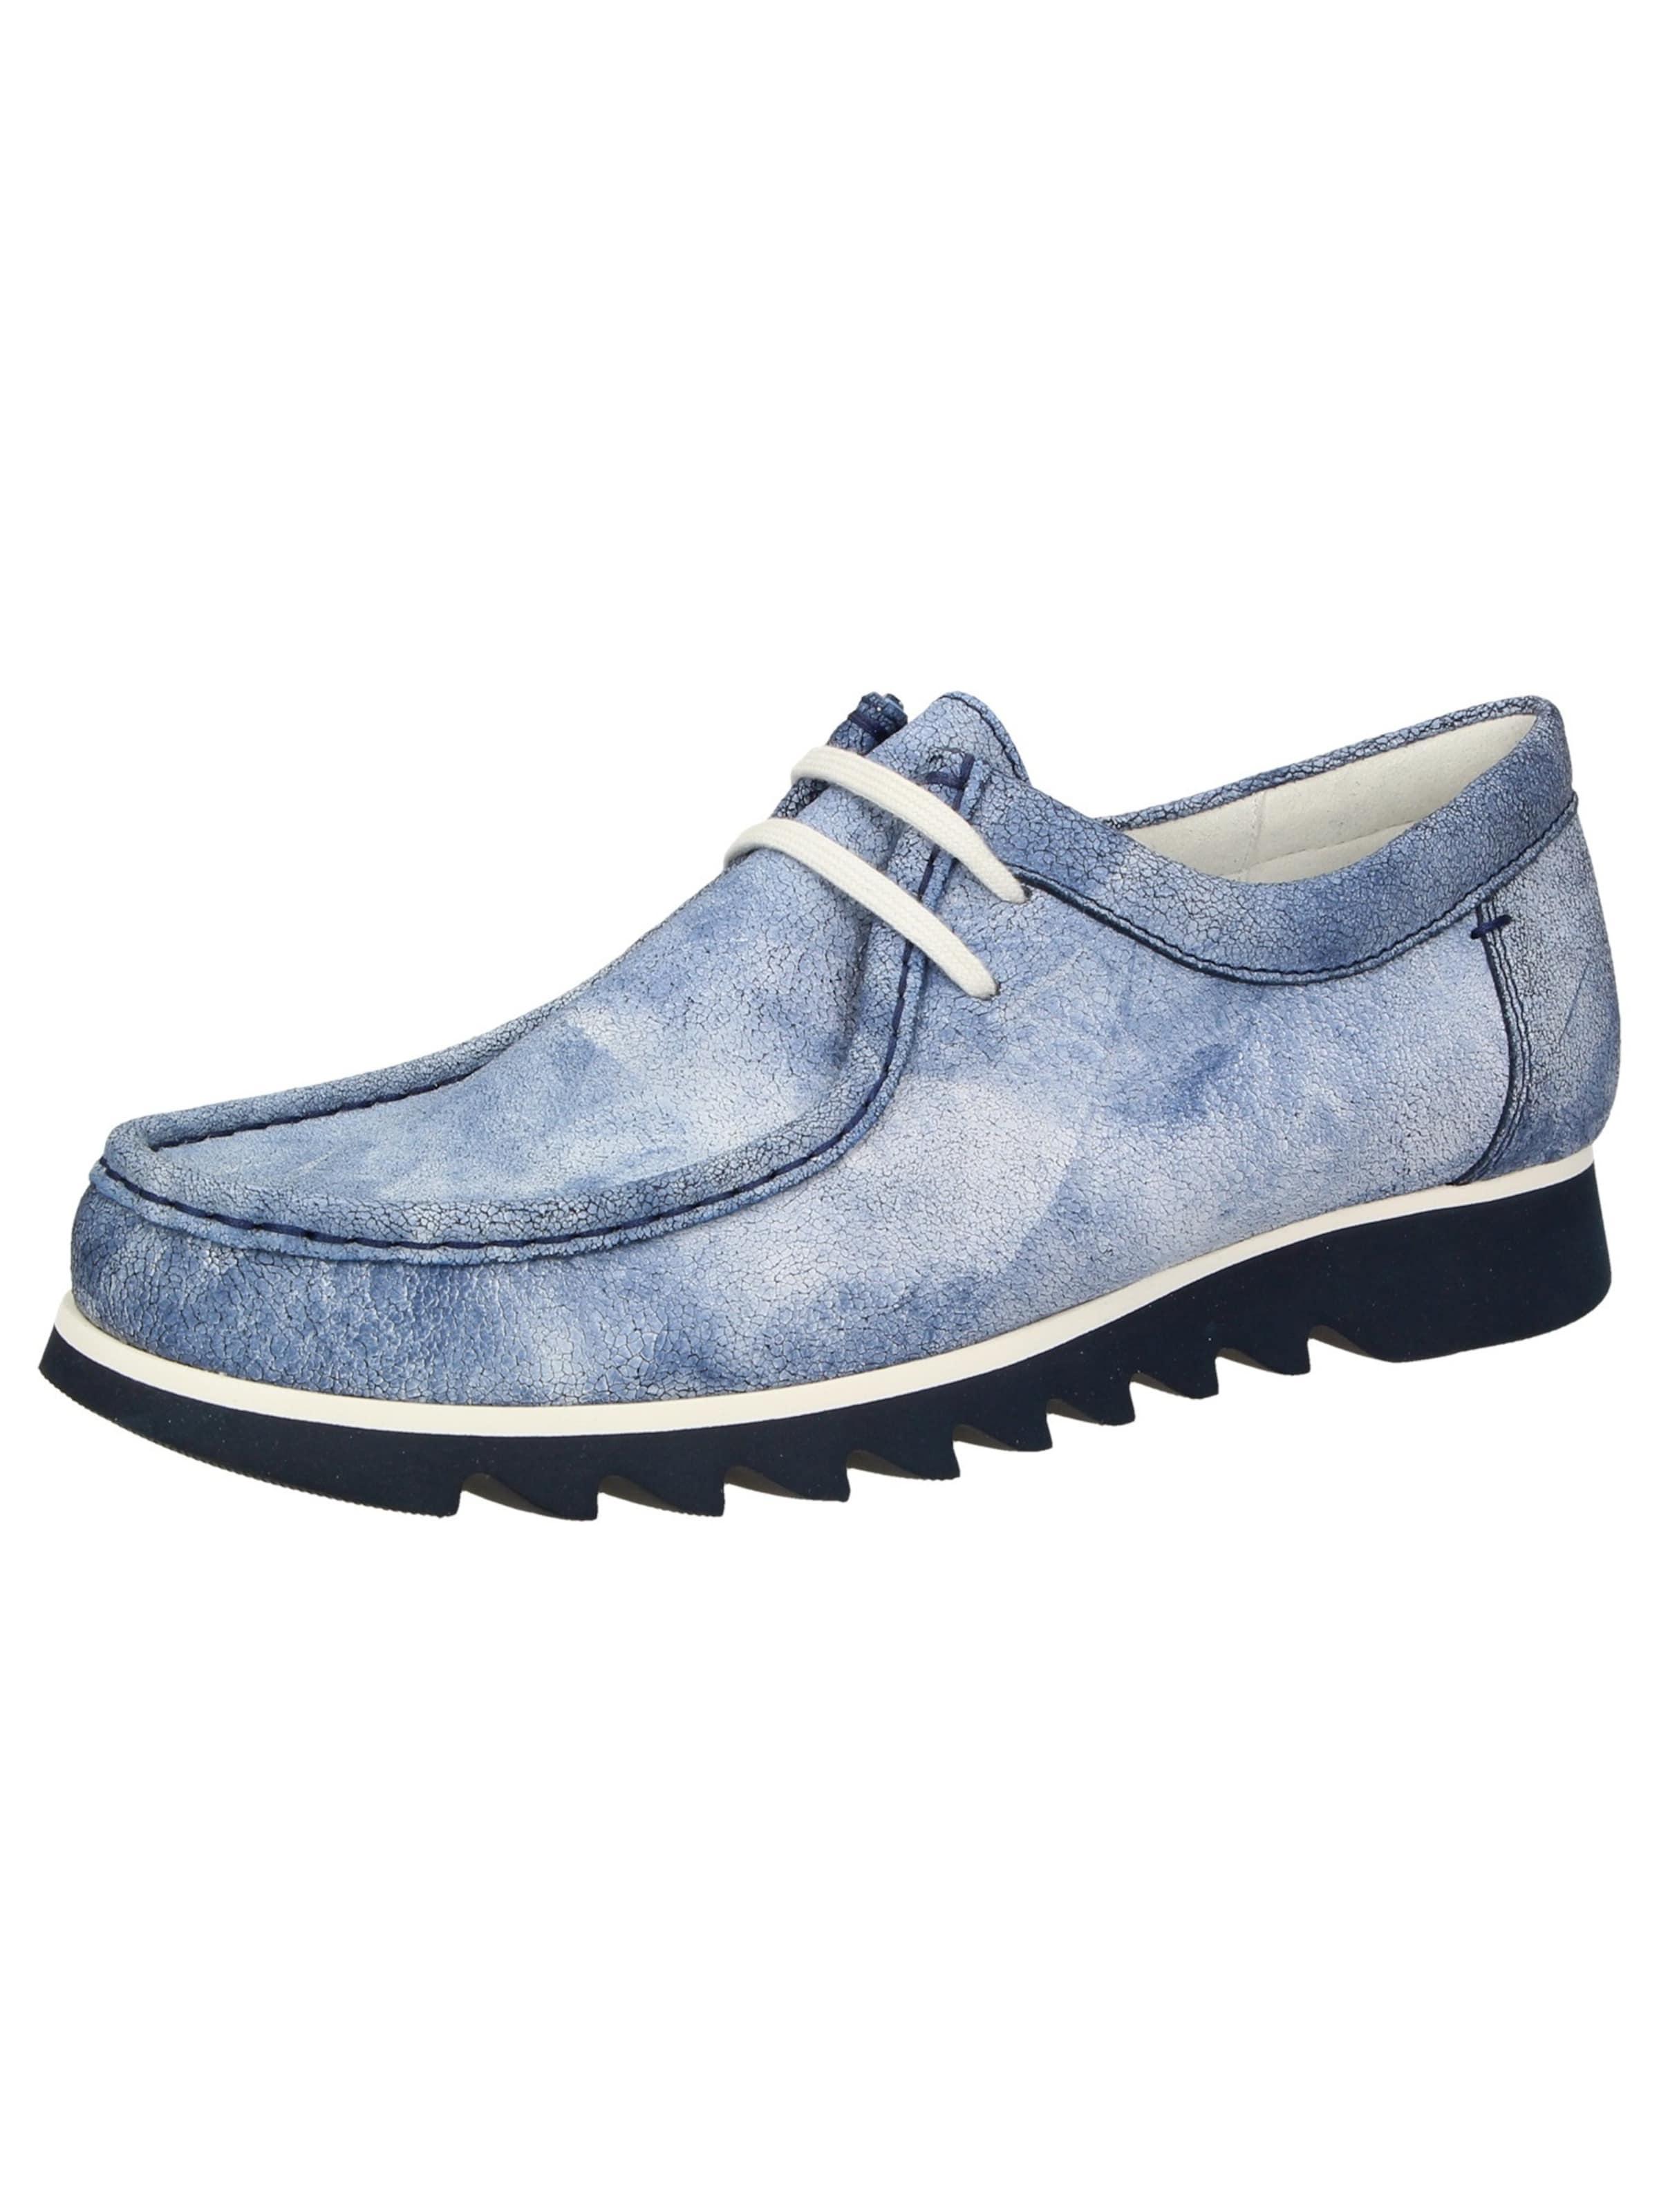 Haltbare Mode billige Schuhe SIOUX | Mokassin 'Grash.-H172-21' Schuhe Gut getragene Schuhe